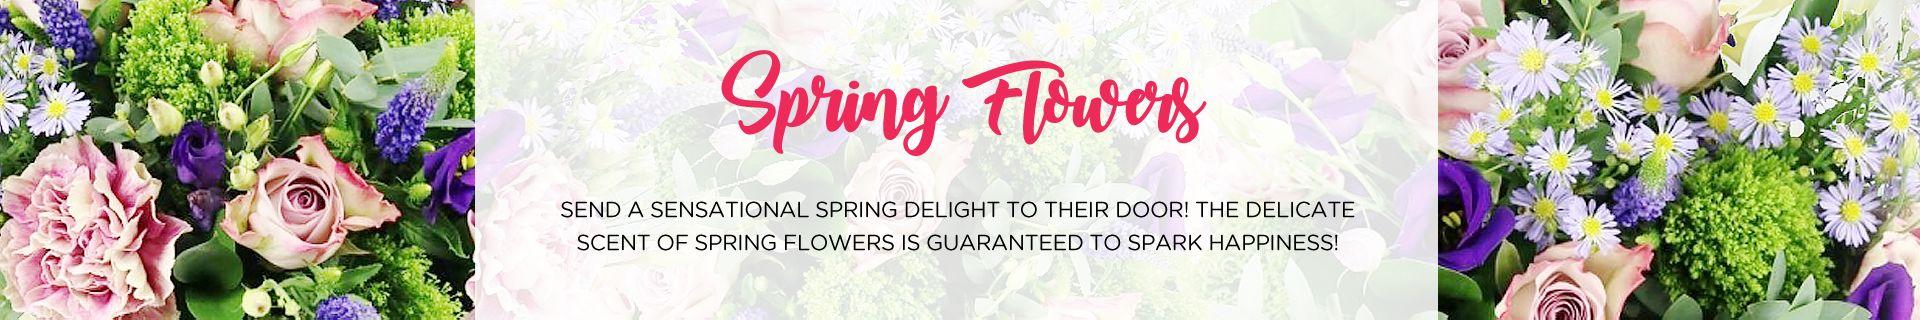 SRING FLOWERS